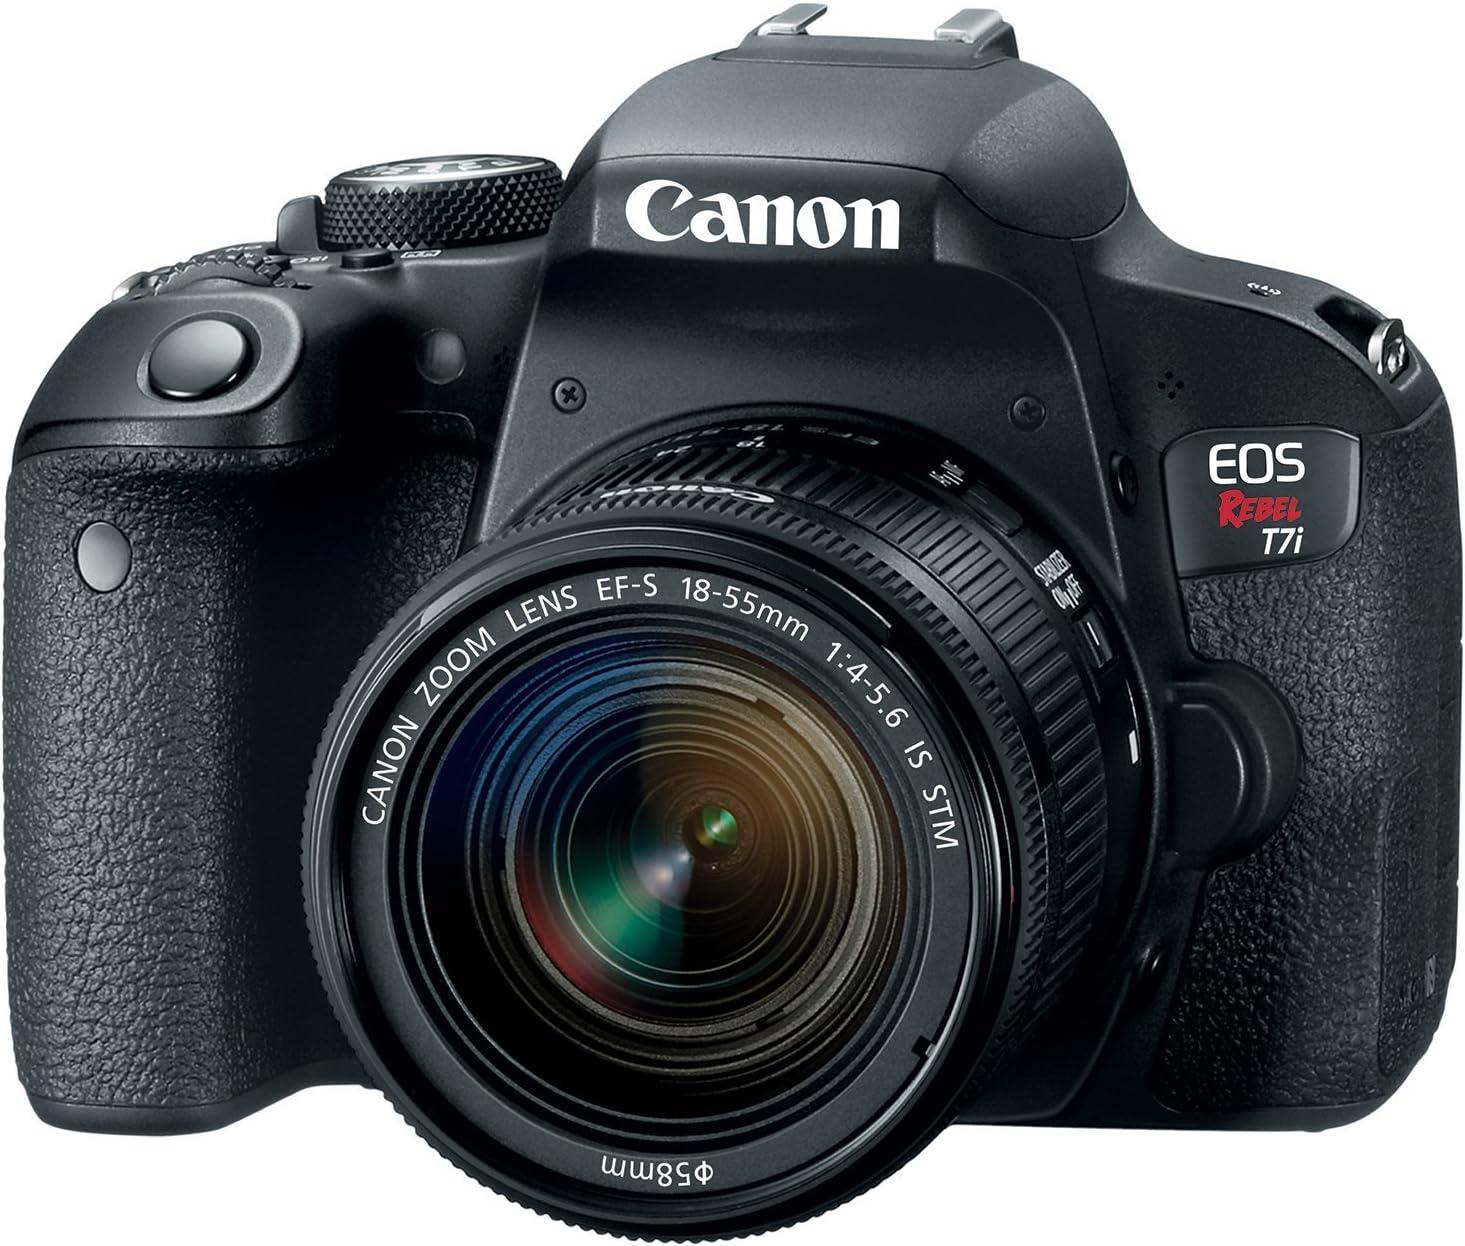 Canon EOS Rebel T7i EF-S 18-55 STM Renewed Soldering is Kit Max 40% OFF